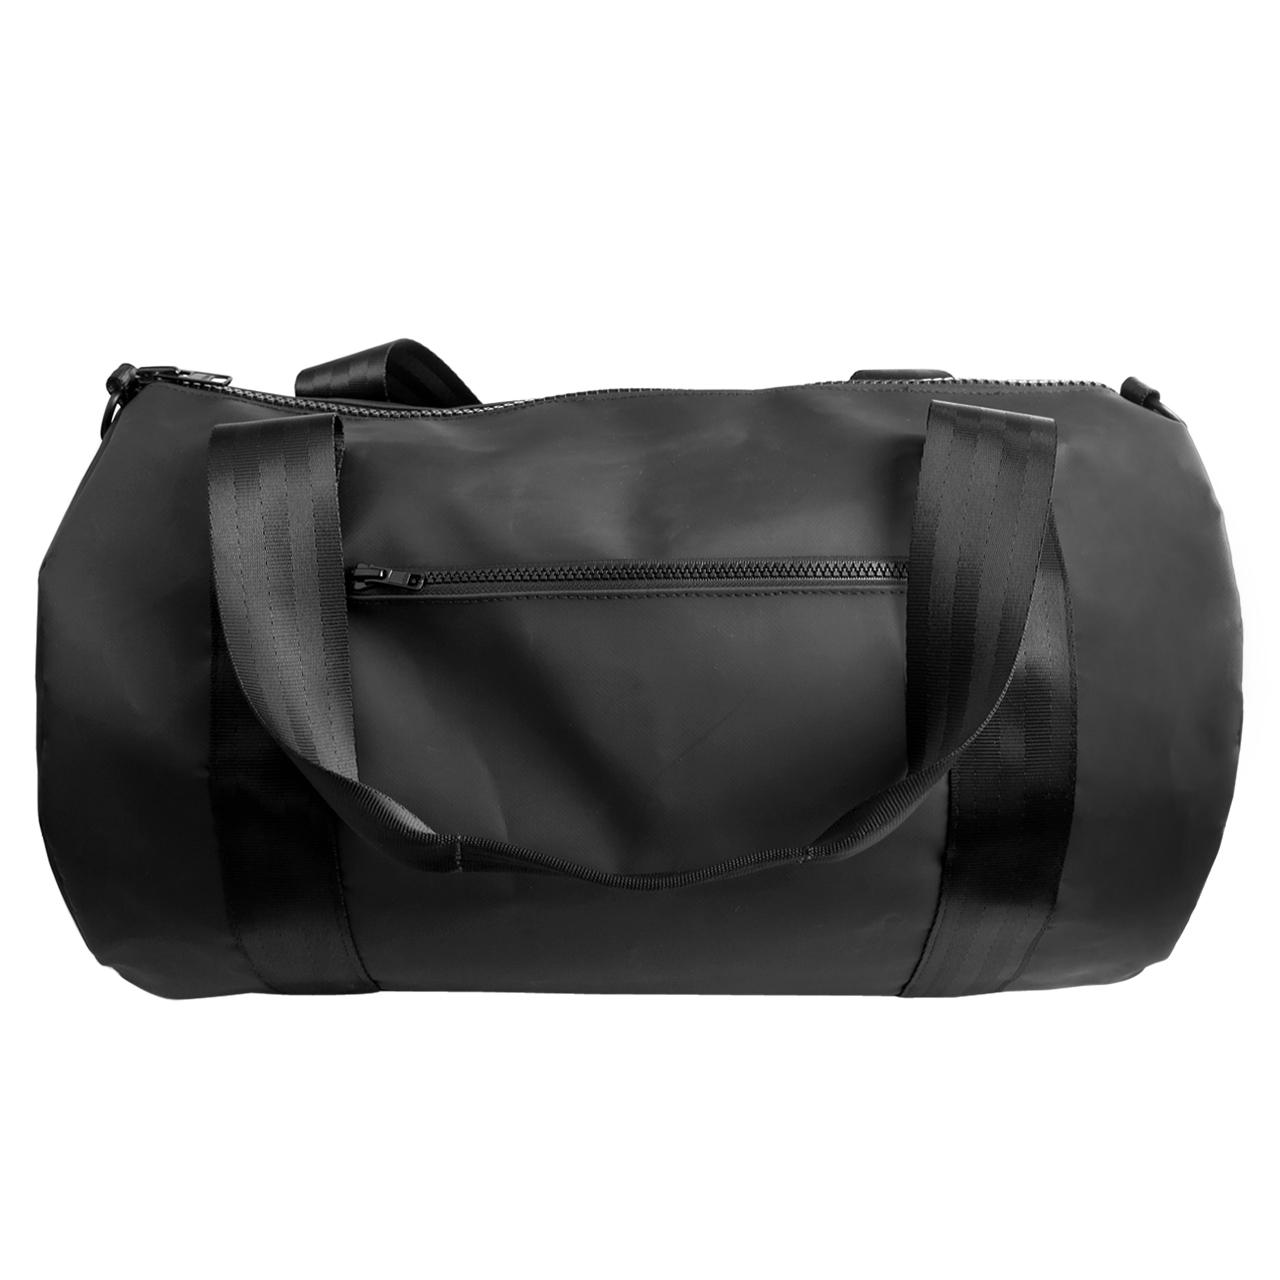 b1a4d199bd27e Scent Proof Ziplock Bags Hunting